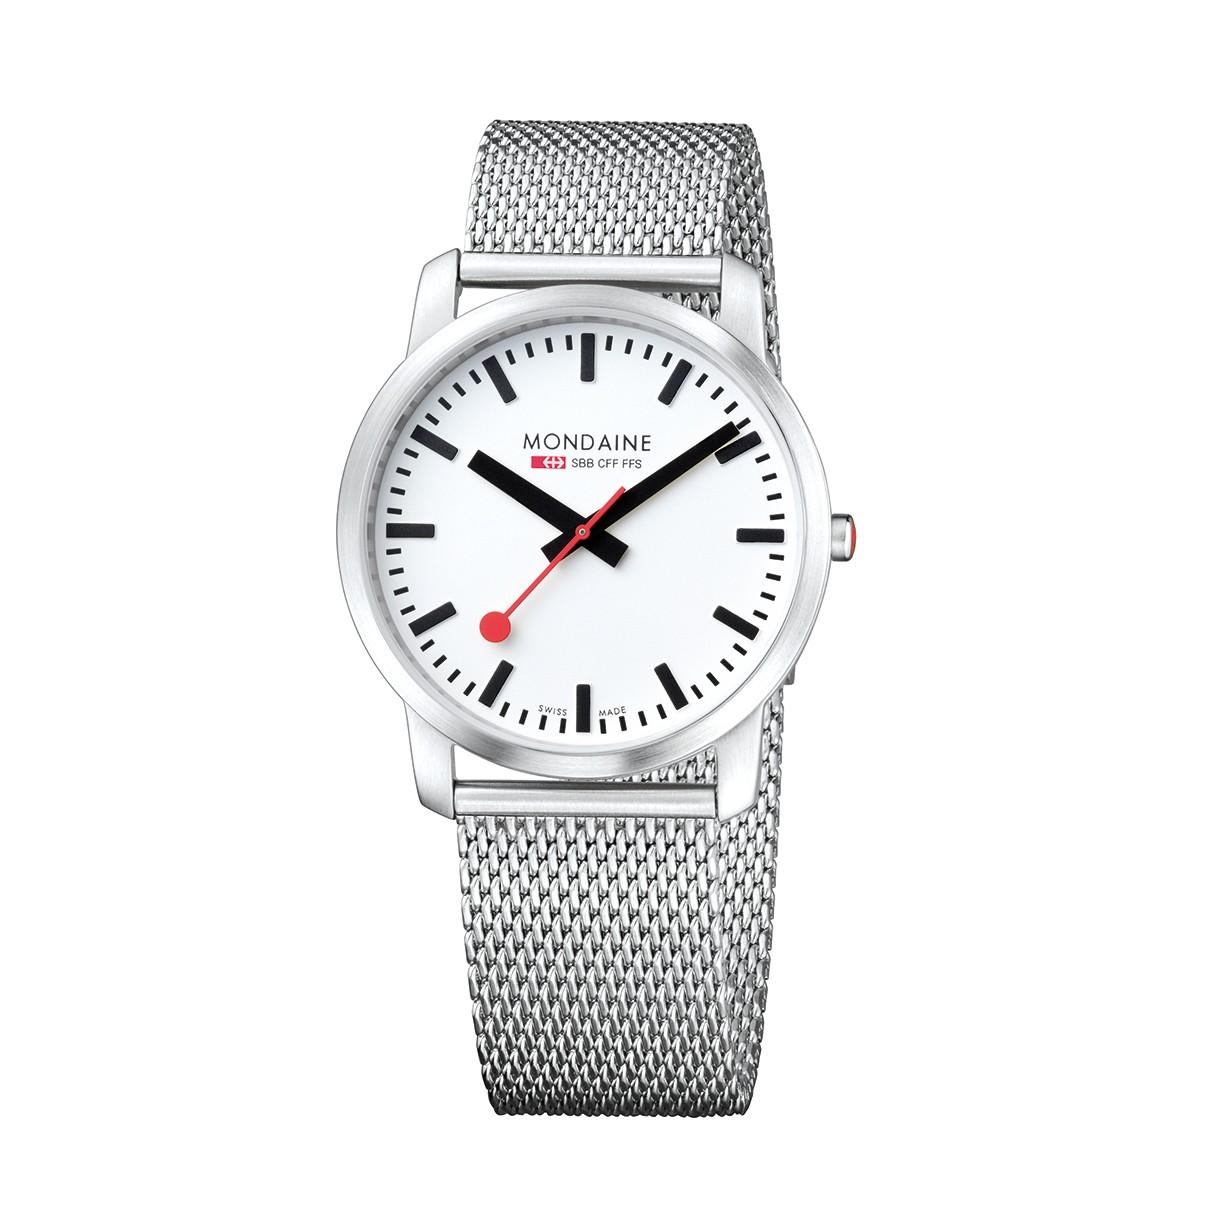 Mondaine swiss watch SIMPLY ELEGANT GENTS - A638.30350.16SBM